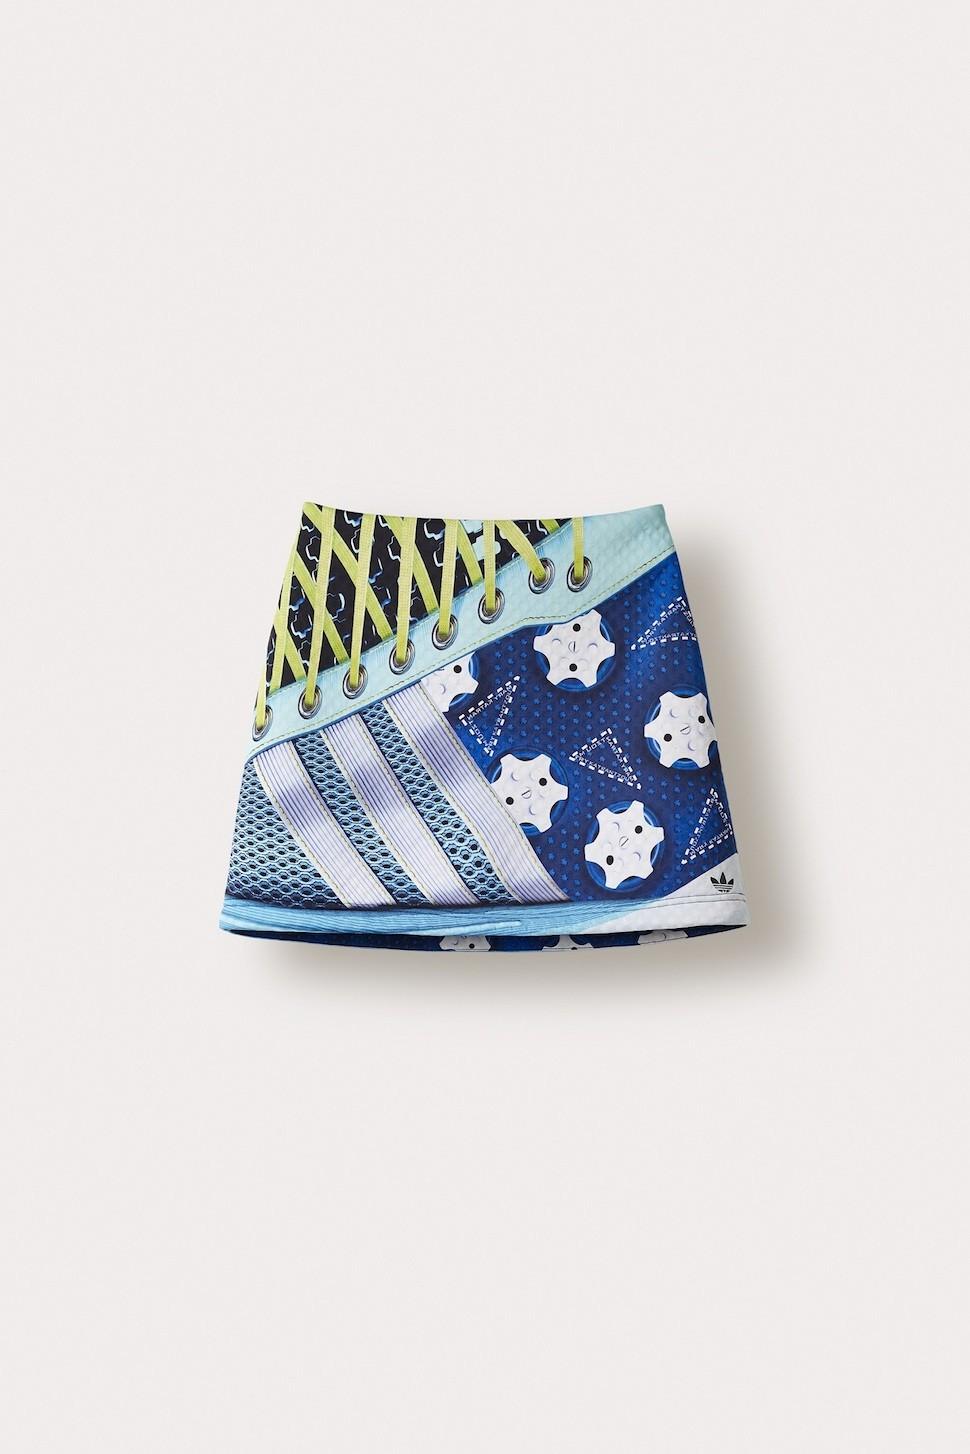 adidas Originals by Mary Katrantzou A字型短裙 NTD 7000